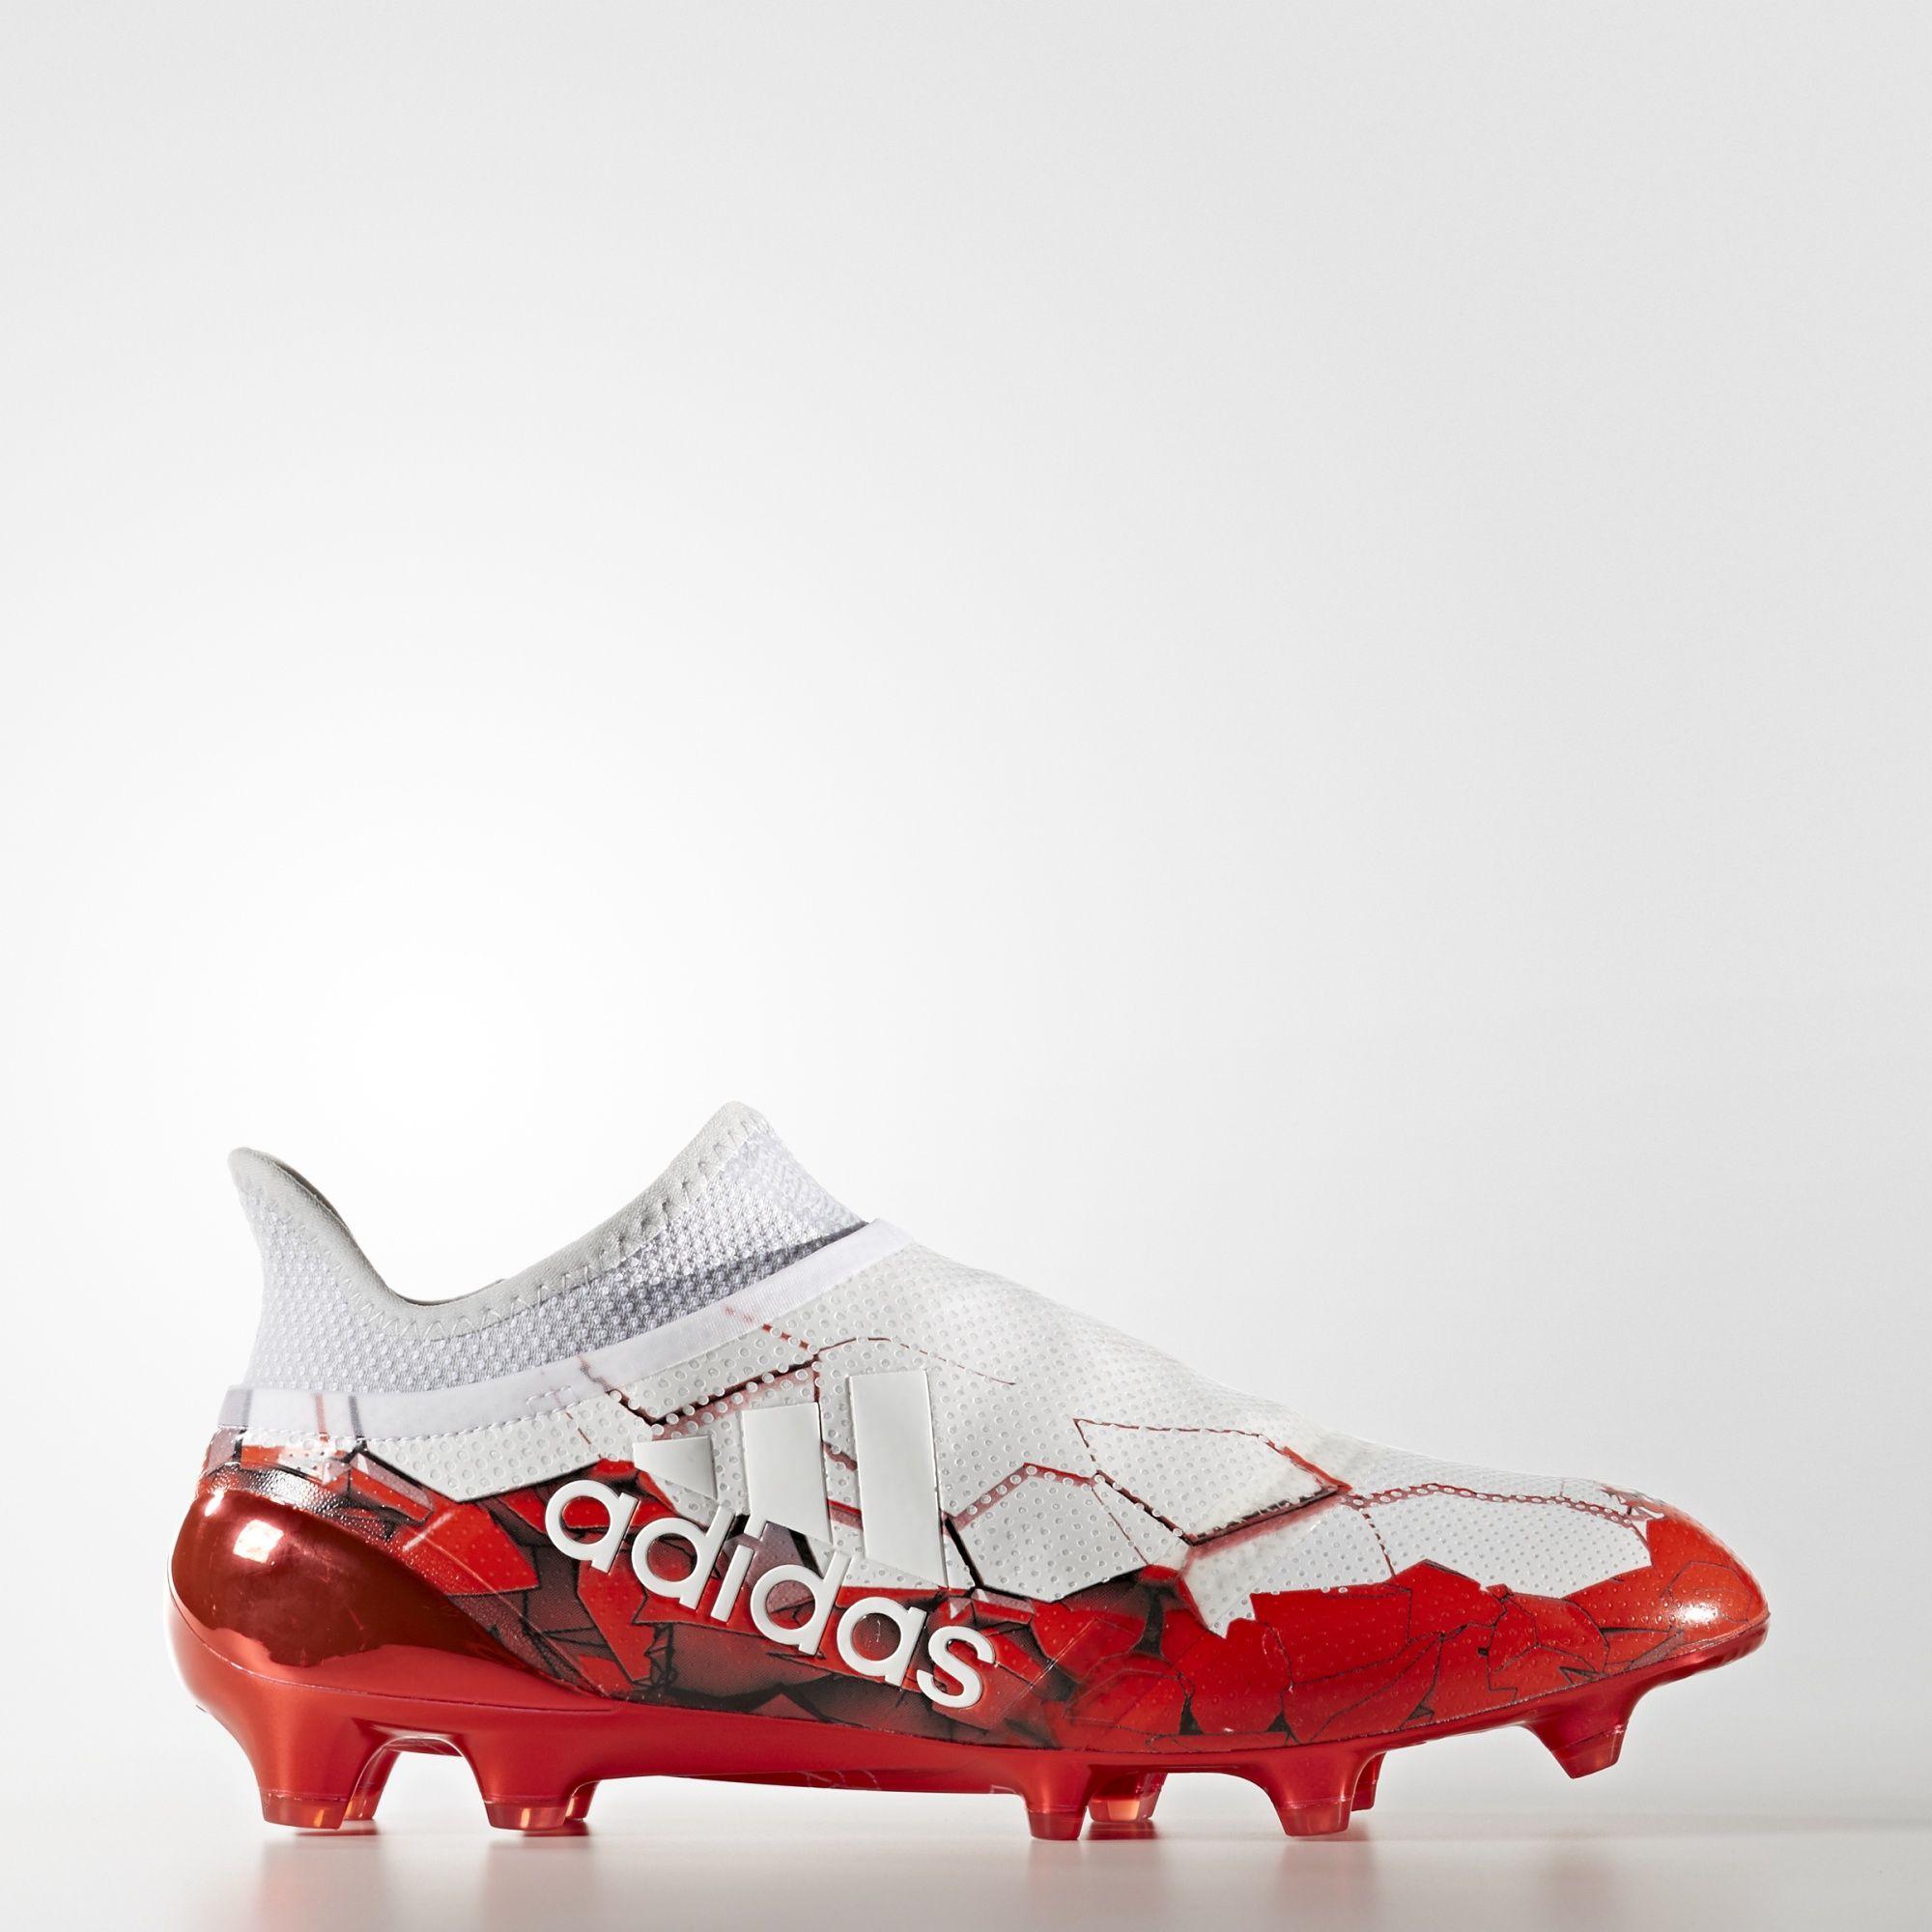 on sale 3e876 82b8d Adidas X 16+ PureSpeed FIFA Confederations Cup FG - Footwear ...